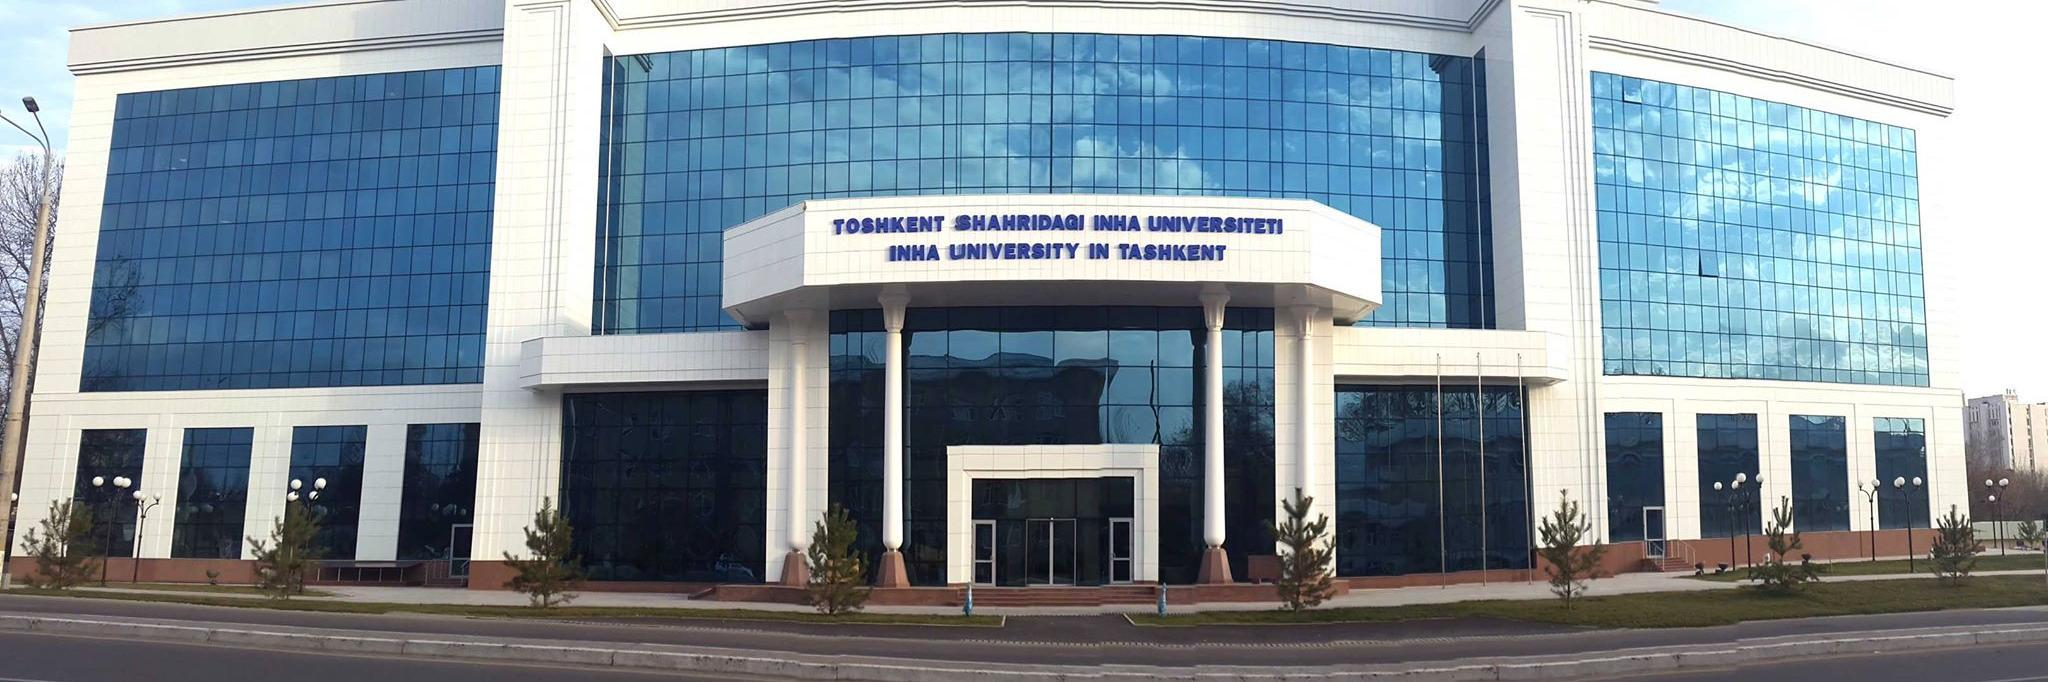 Toshkent Shahridagi Inha Universiteti's official Twitter account